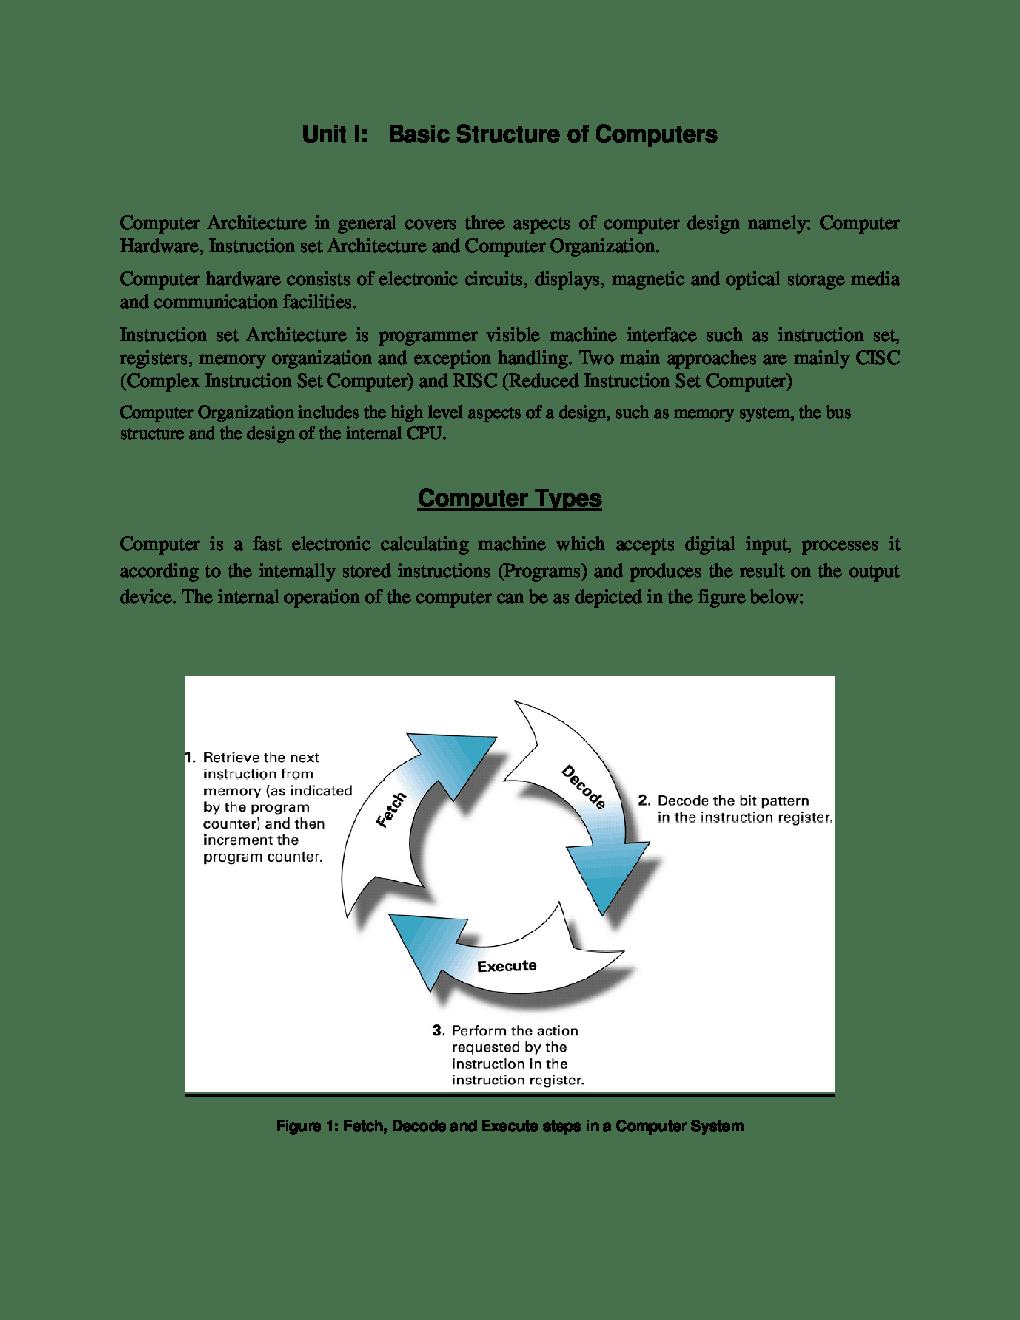 Download VTU eNotes On Computer Organisation (Computer